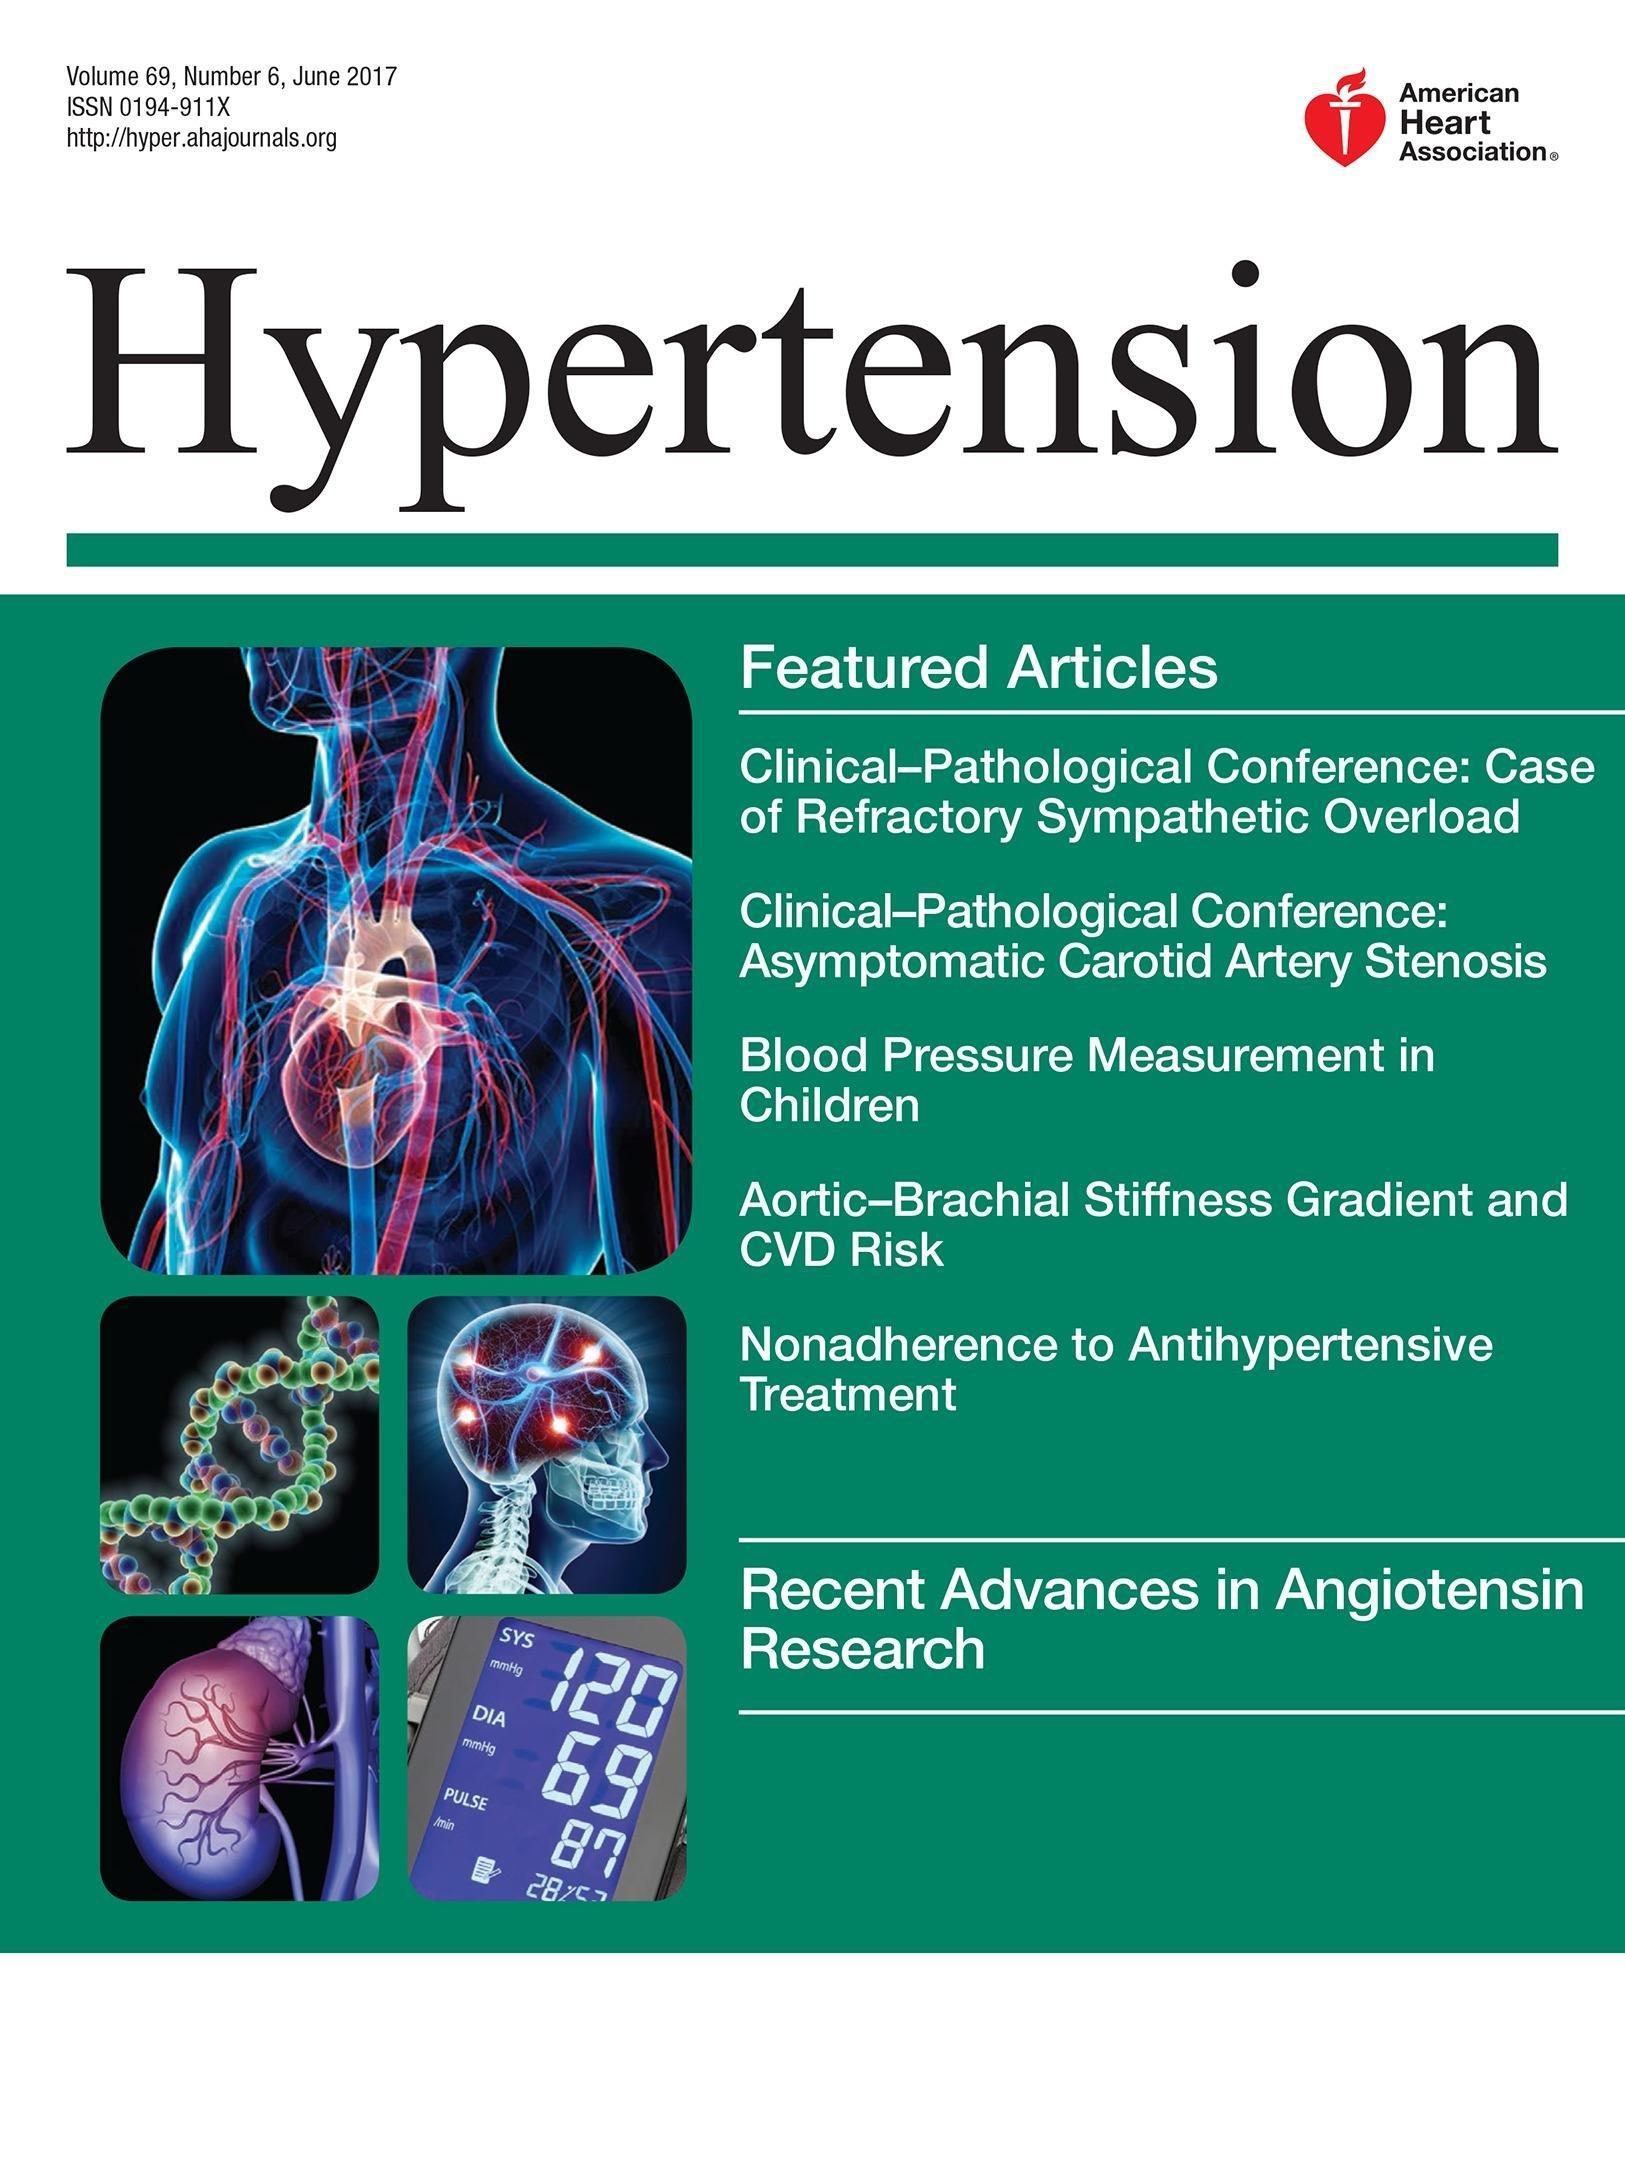 Longitudinal Study Of Hypertensive Subjects With Type 2 Diabetes Mellitus